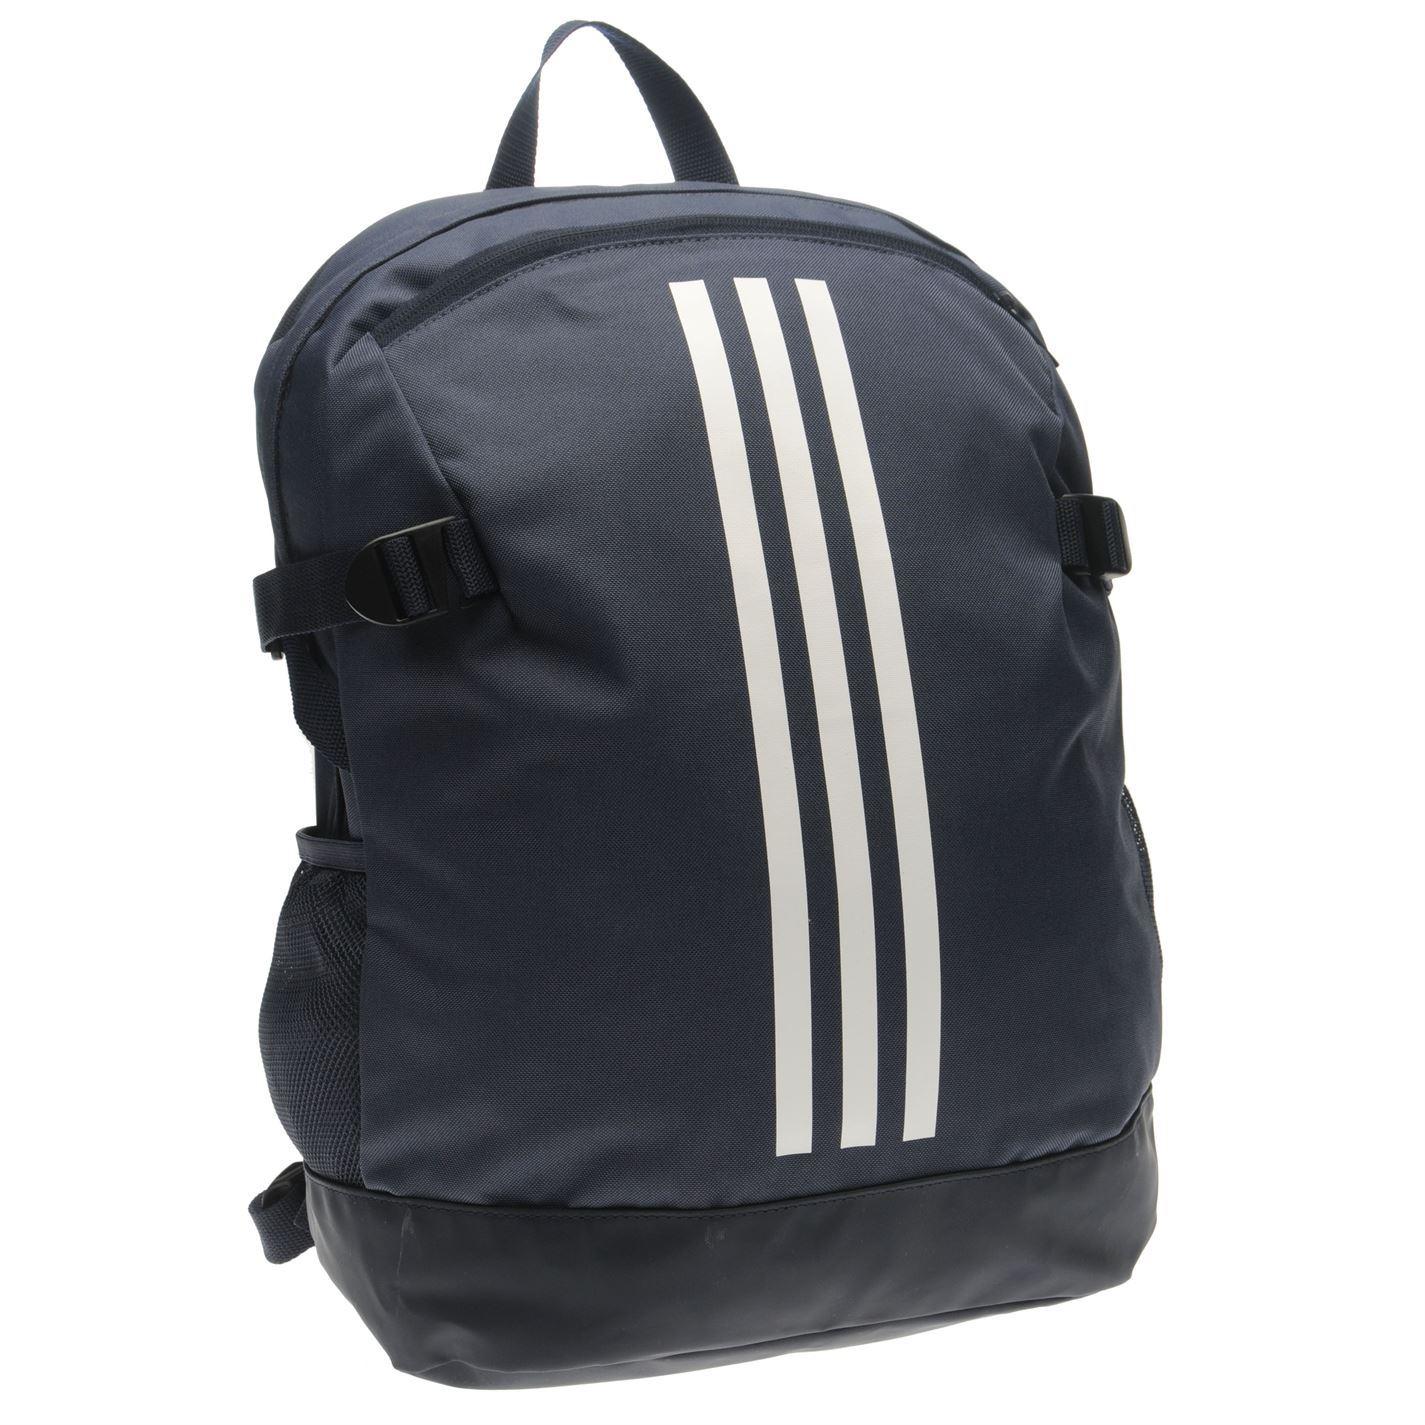 ec13b5f31750 ... adidas Backpacks Bag Rucksack Gymbag Sports ...